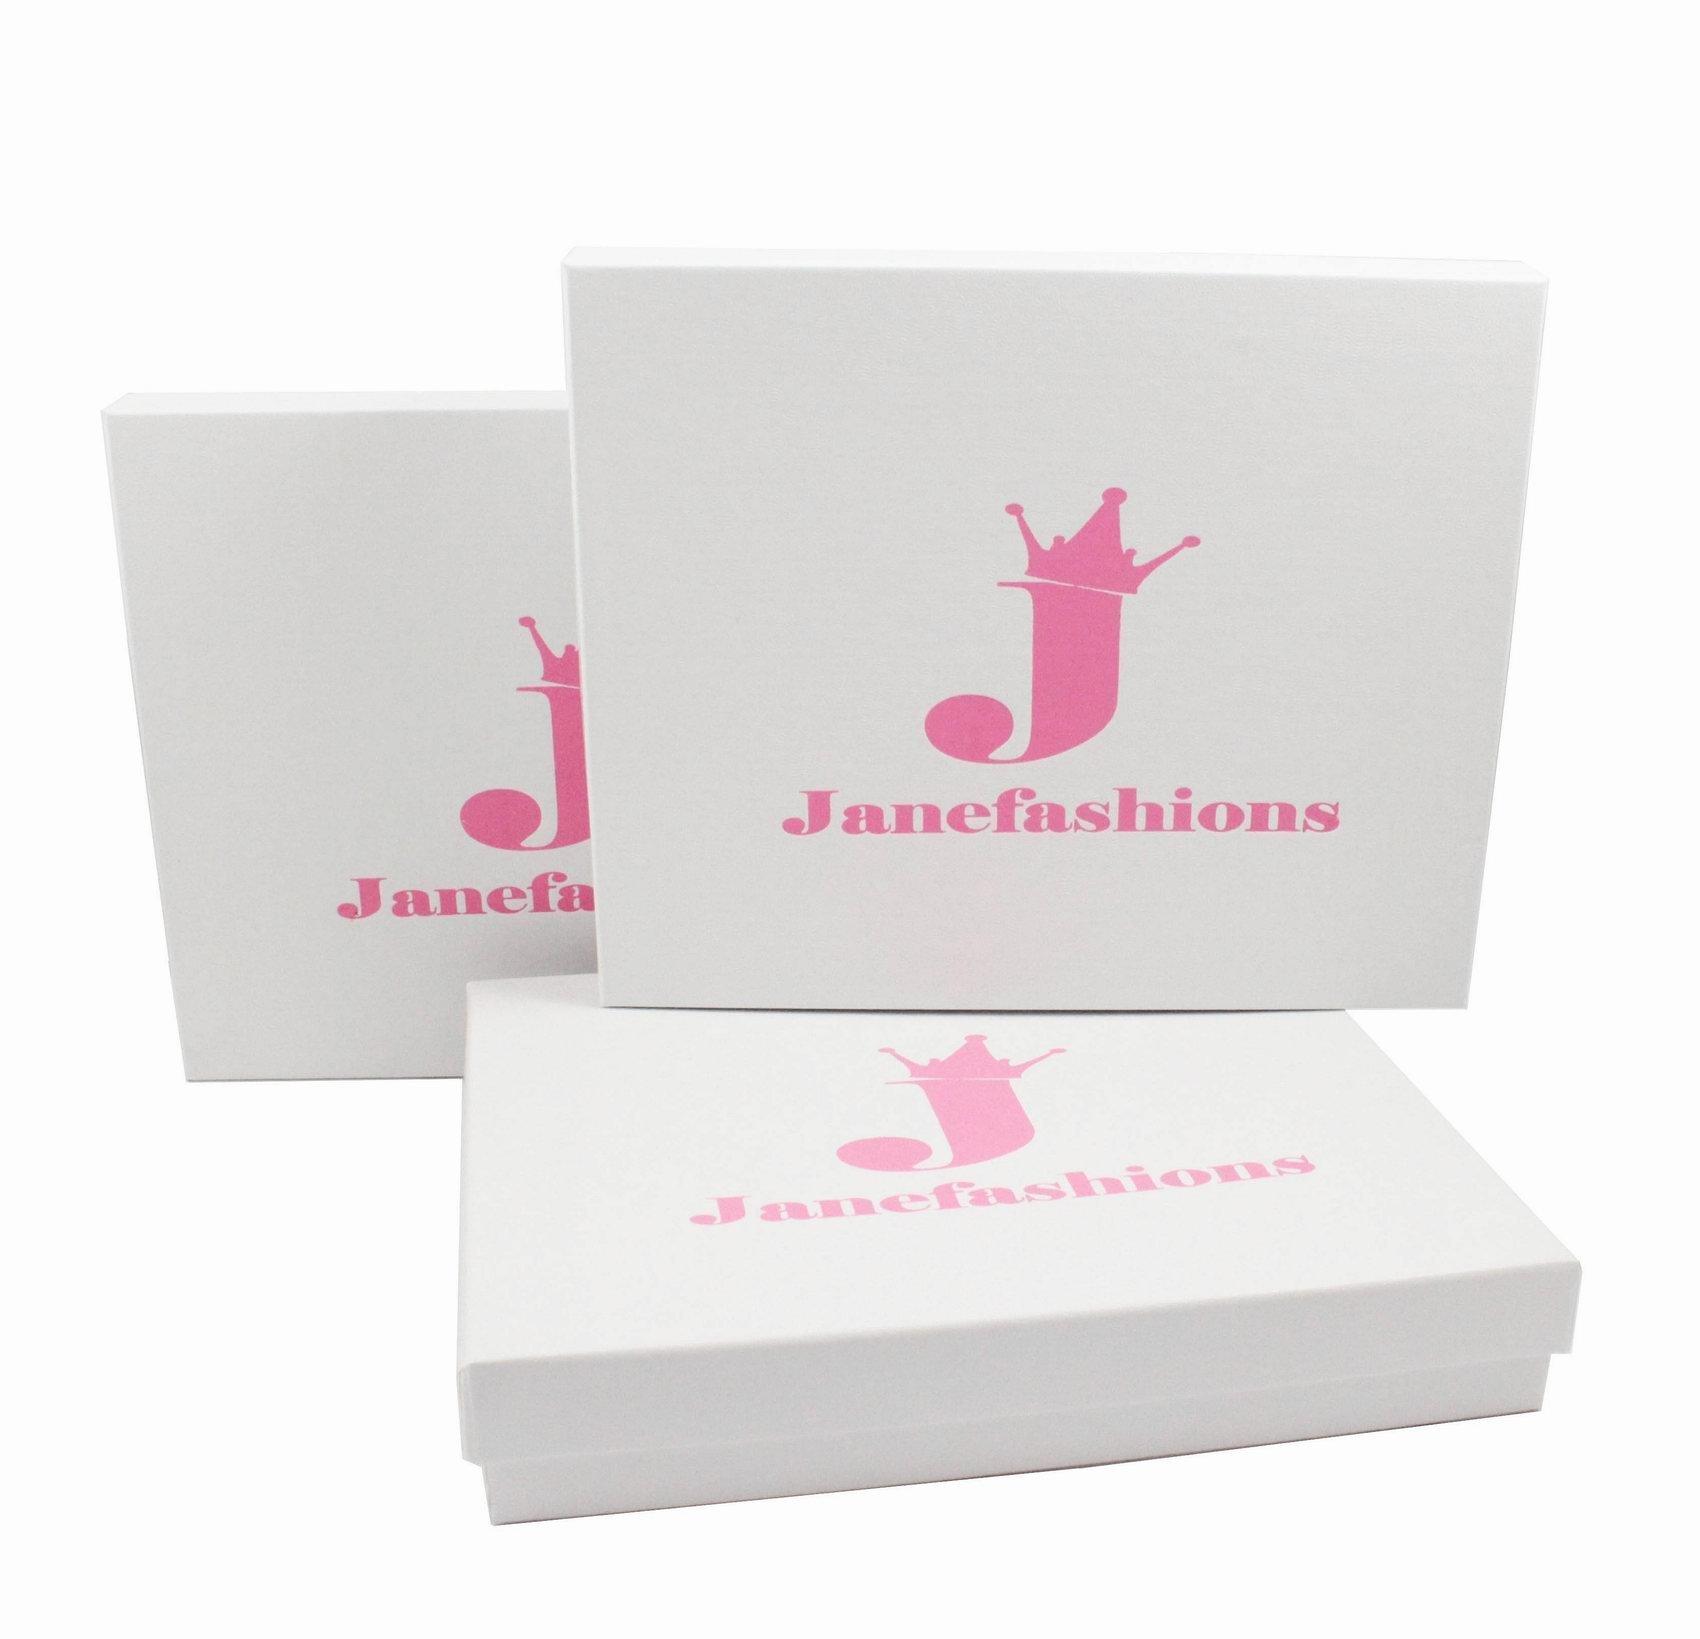 Janefashions 3-row Clear Austrian Clear Rhinestone Choker Necklace Party Wedding Prom N175s Silver